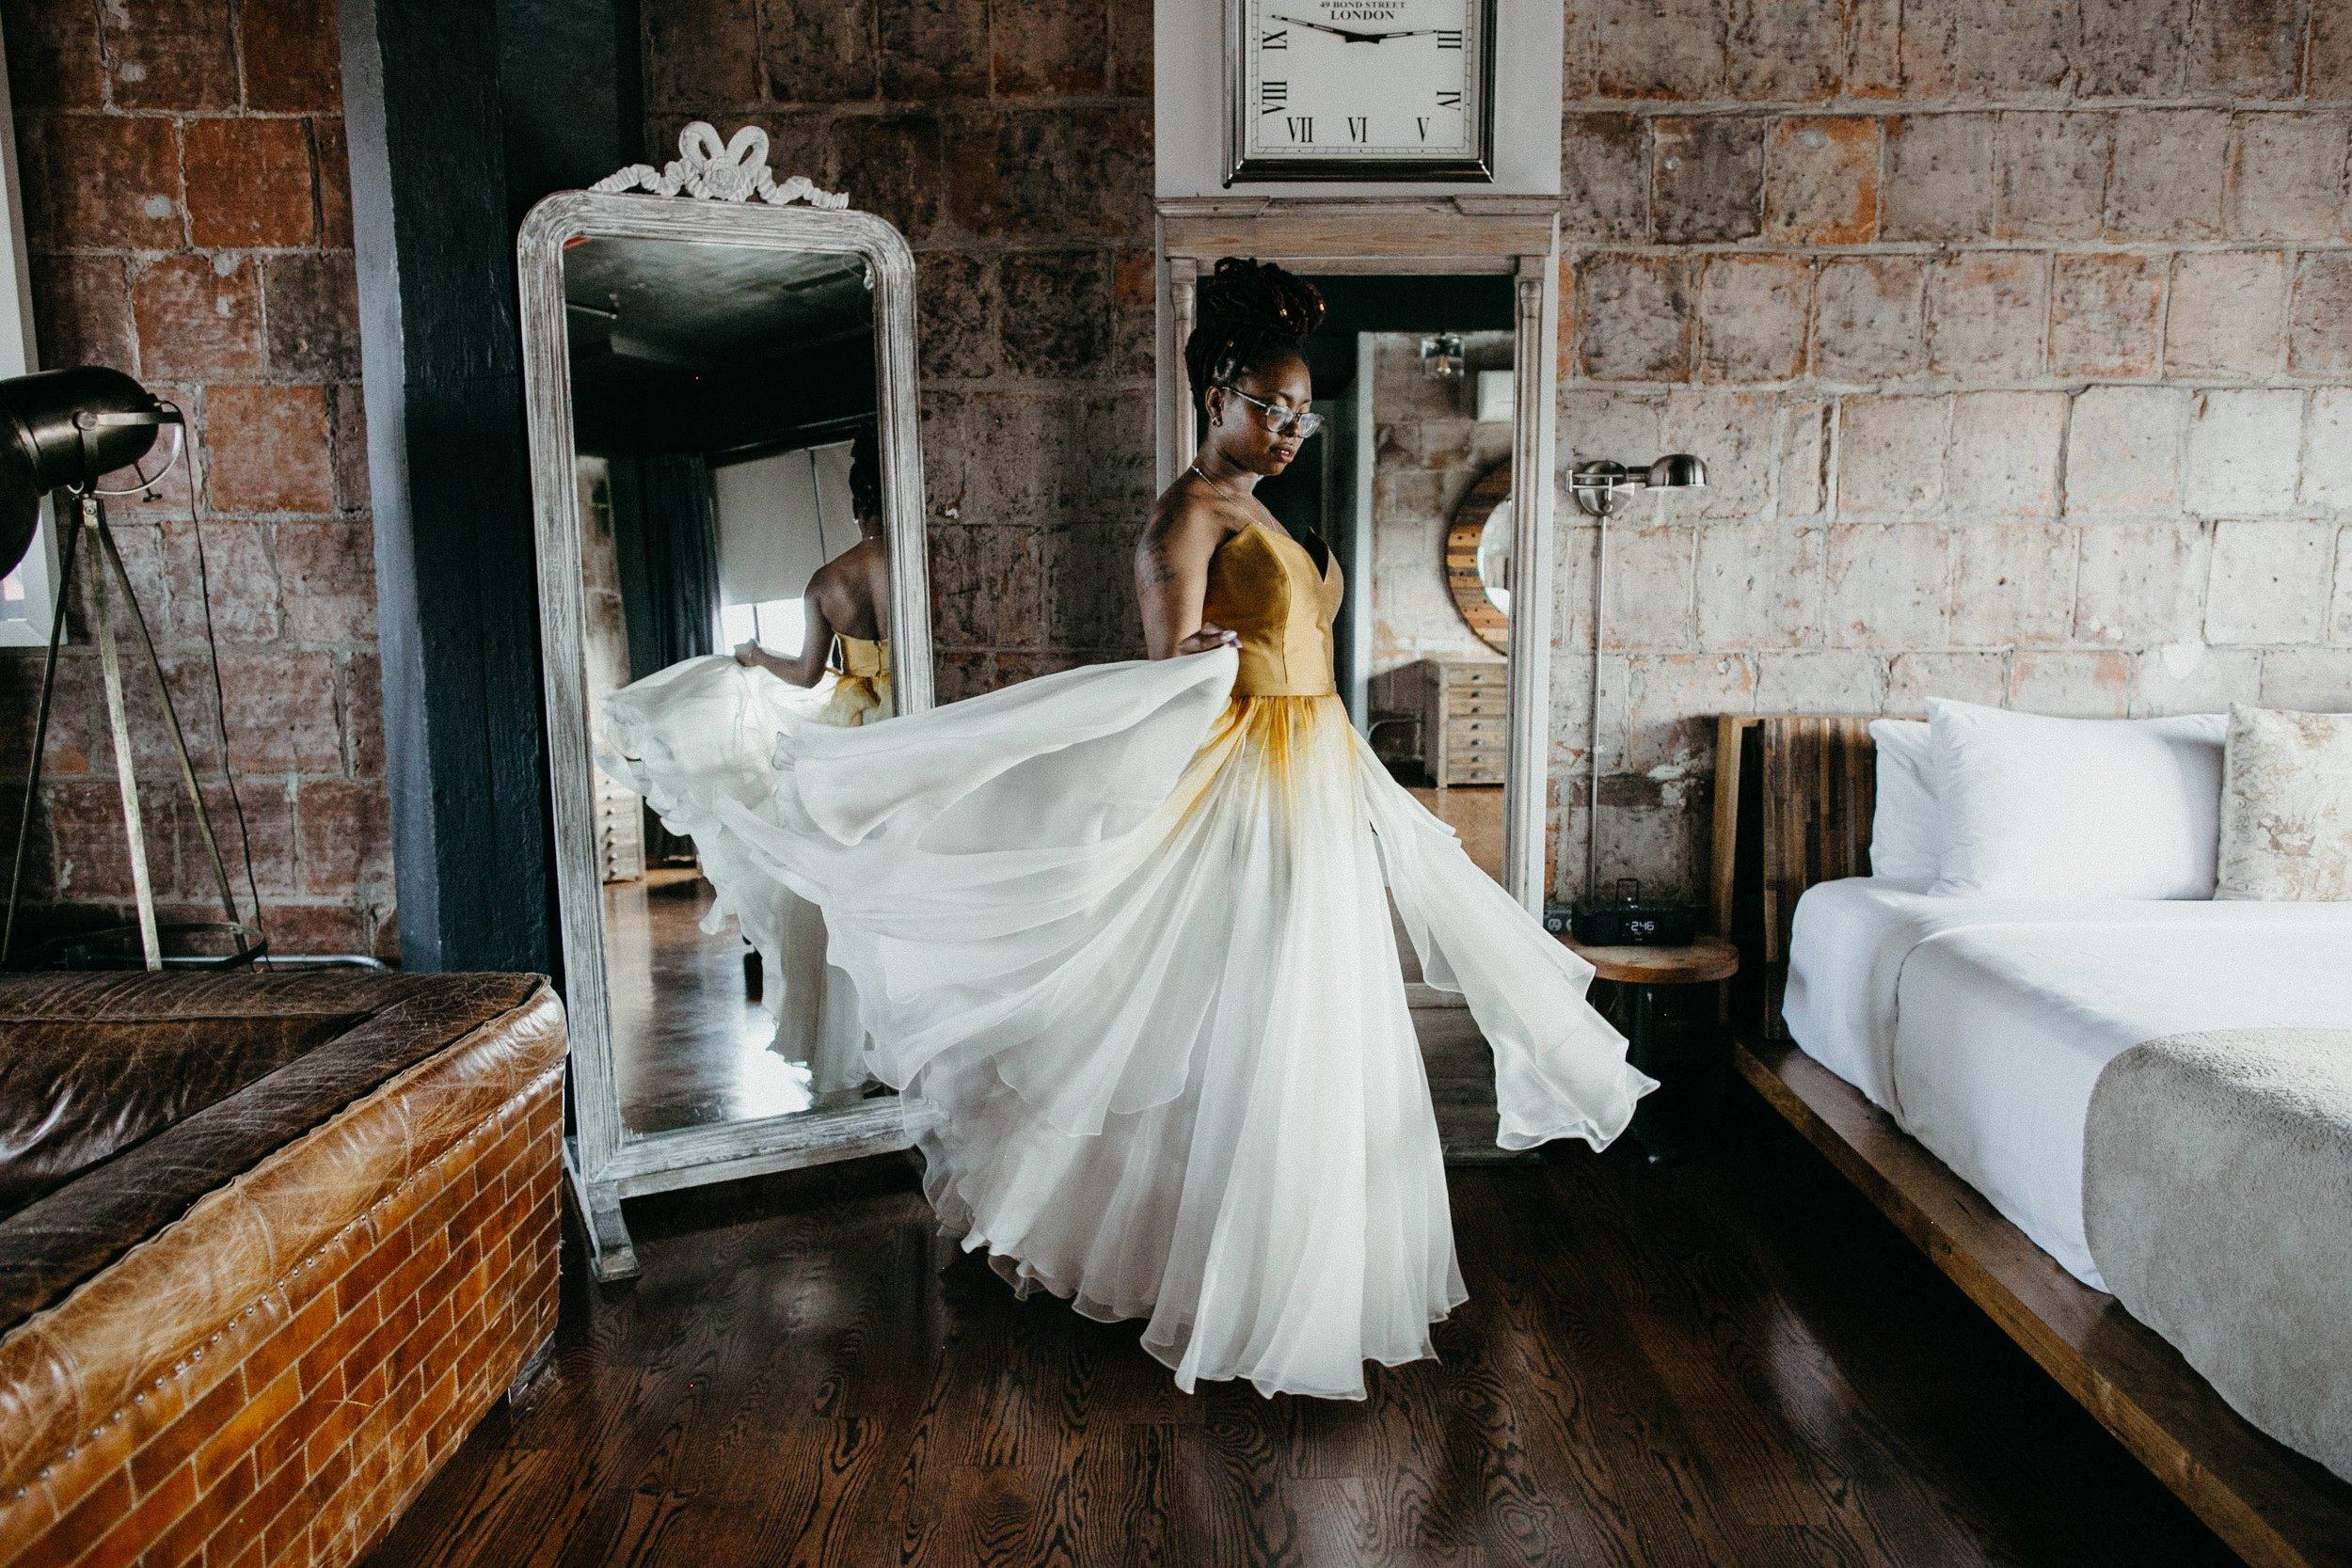 Sevlynn-Photography-Wedding-LIC-Landing-Maiella-NYC-20.jpg